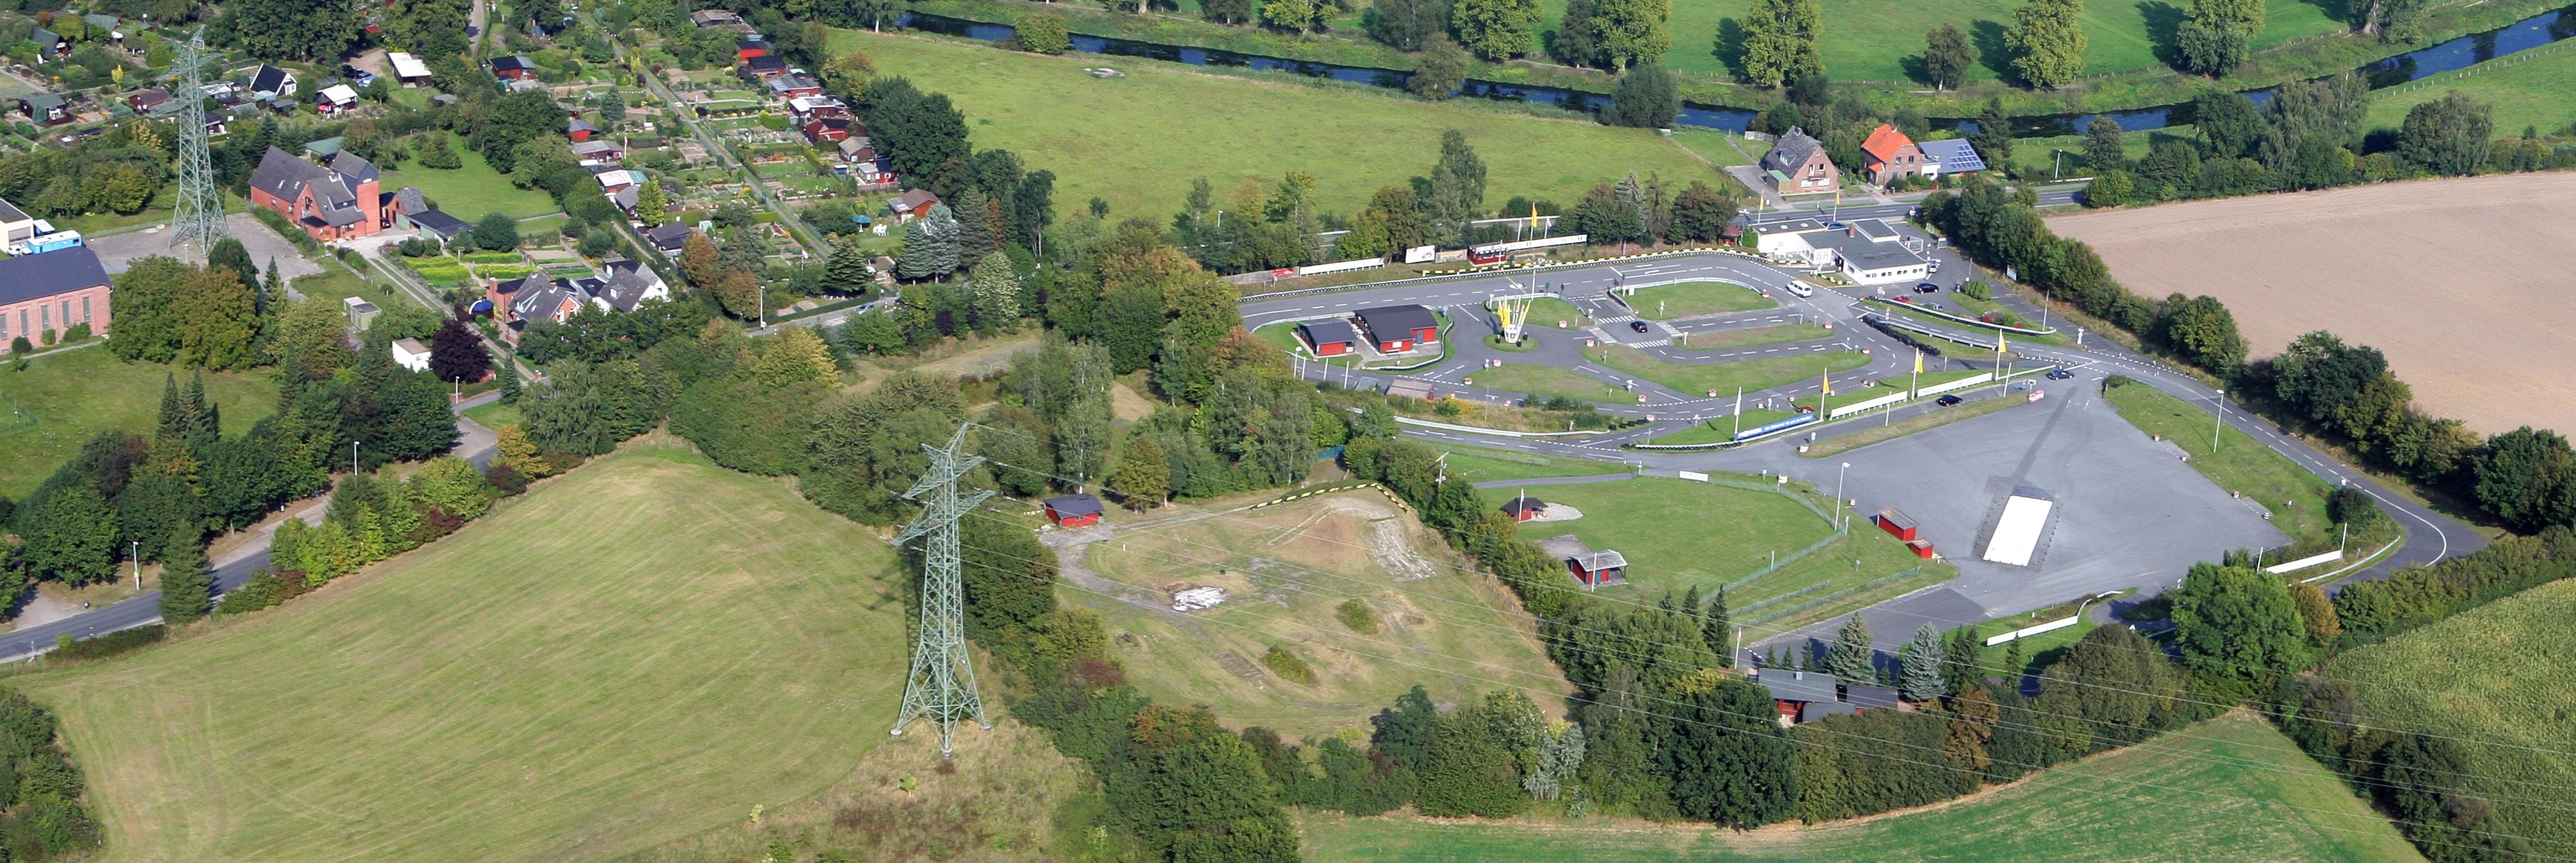 Fahrsicherheitsplatz Bad Oldesloe